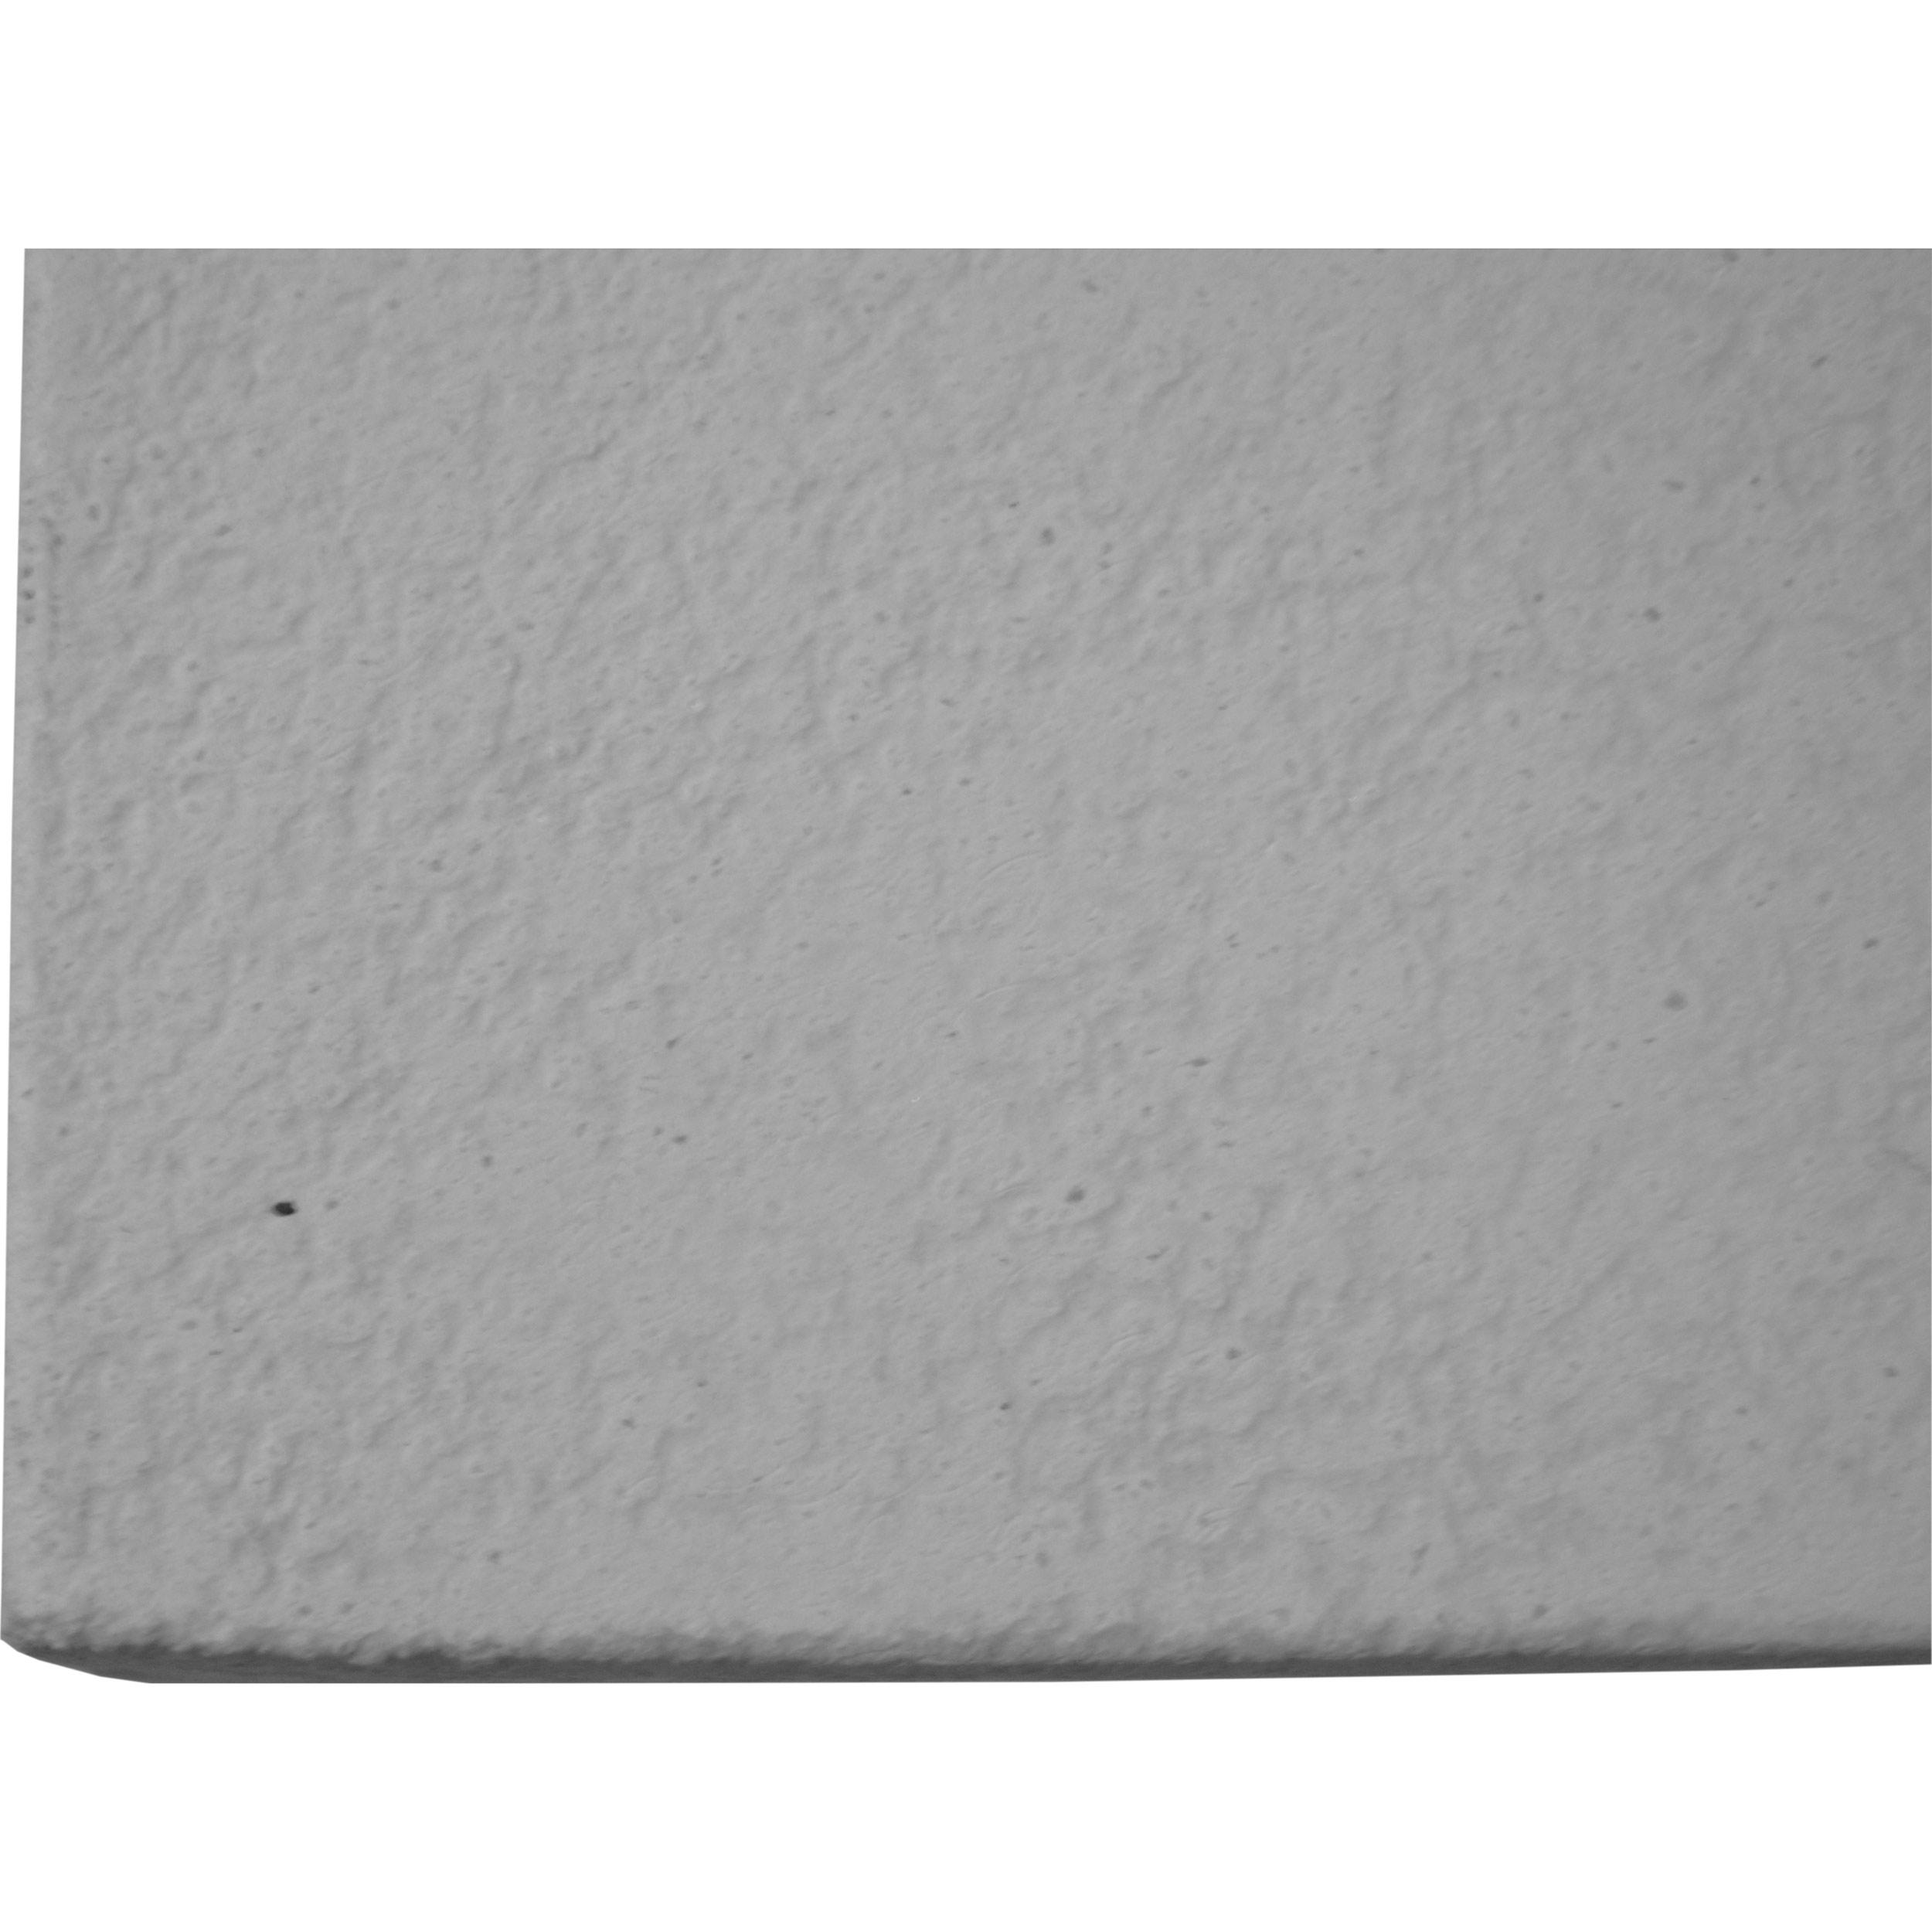 Virginia Modern Rustic Grey Fiberglass Cement Top Teak Wood Stump Outdoor Dining Table - 94 inch